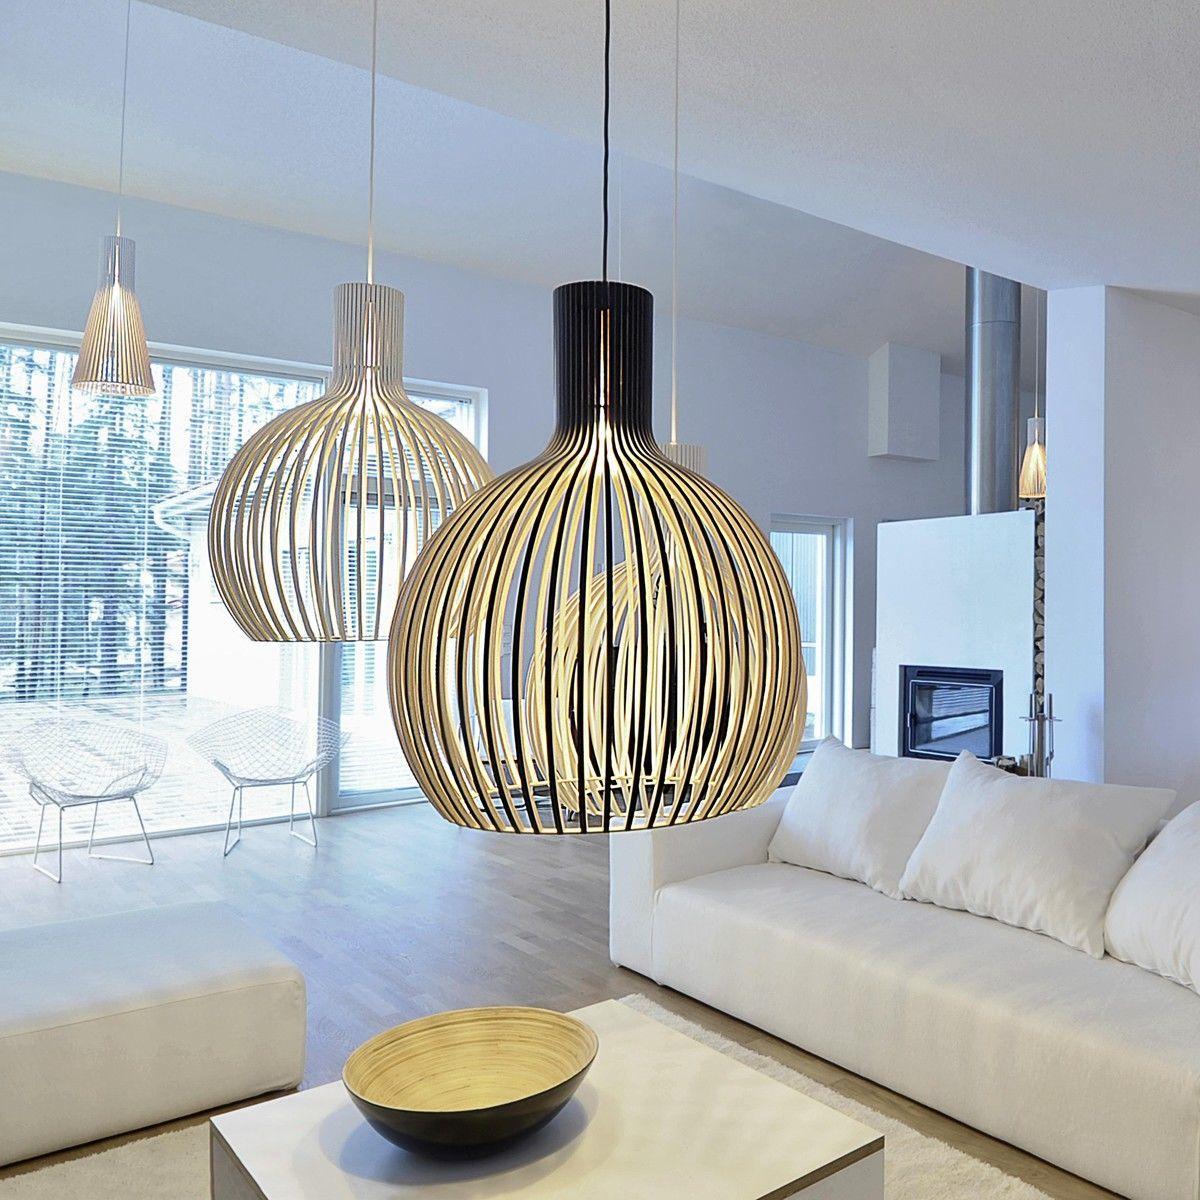 octo 4240 pendellamp secto design. Black Bedroom Furniture Sets. Home Design Ideas